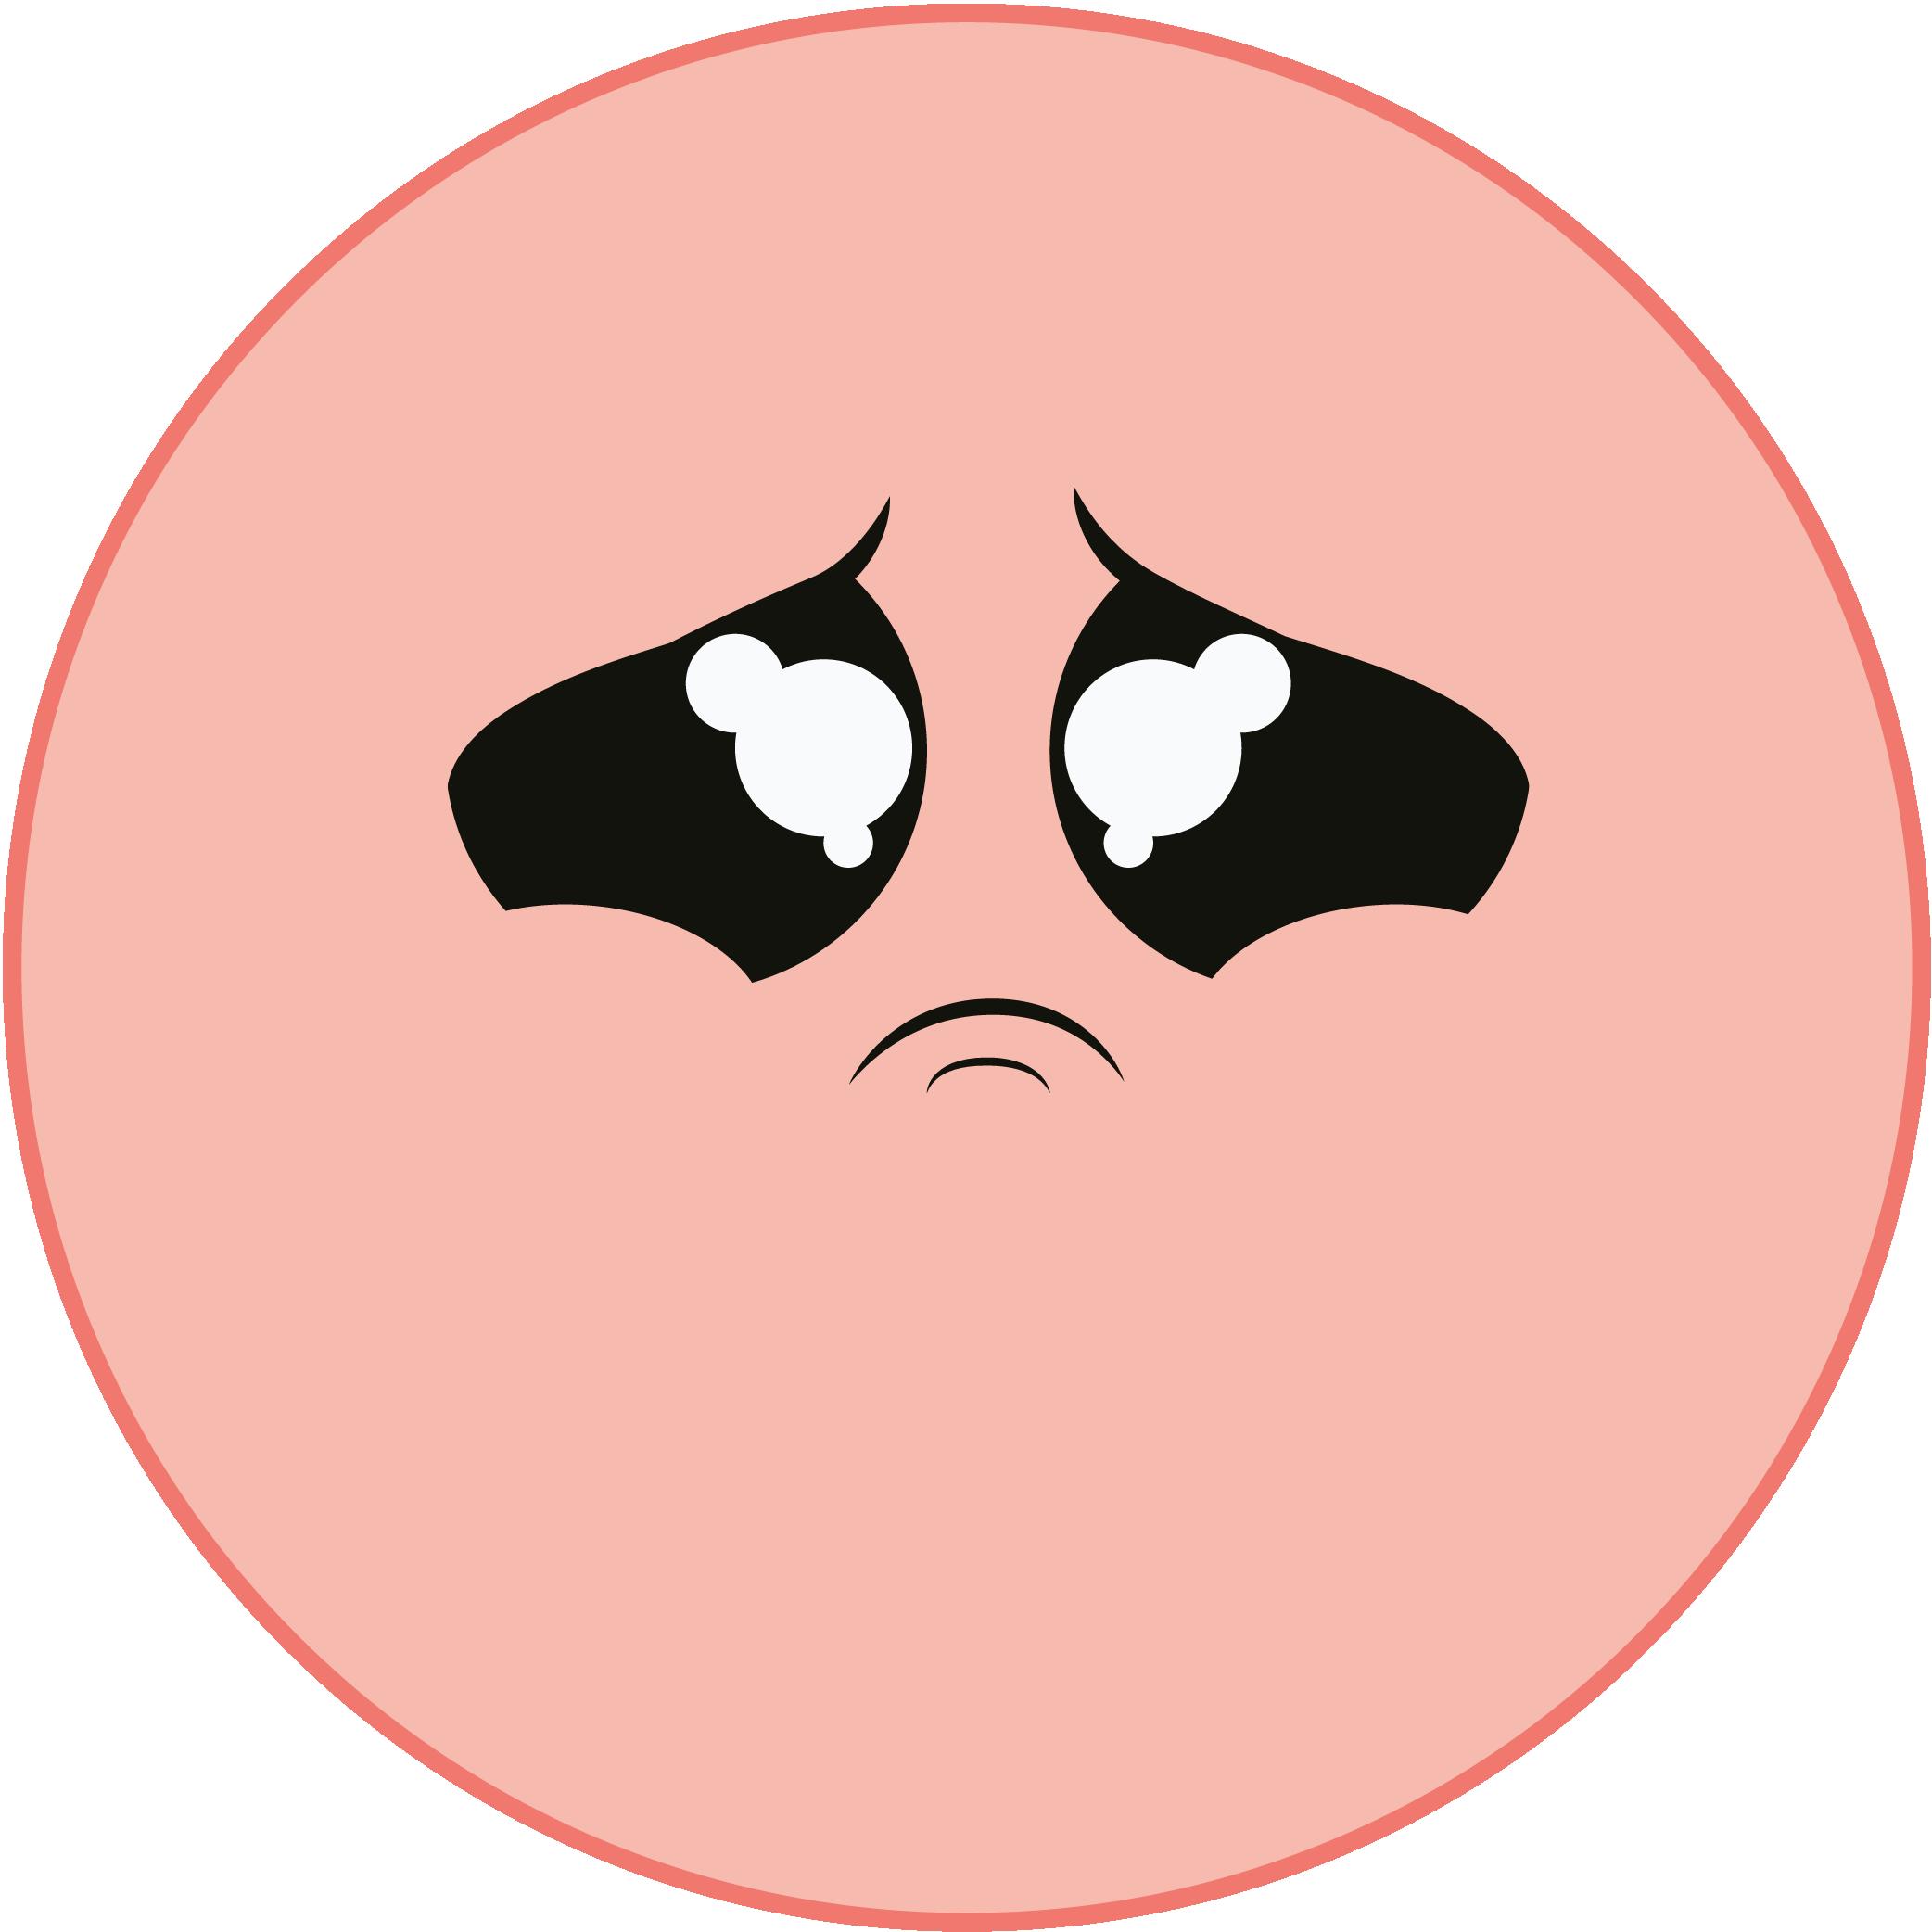 Saddened Coral.png